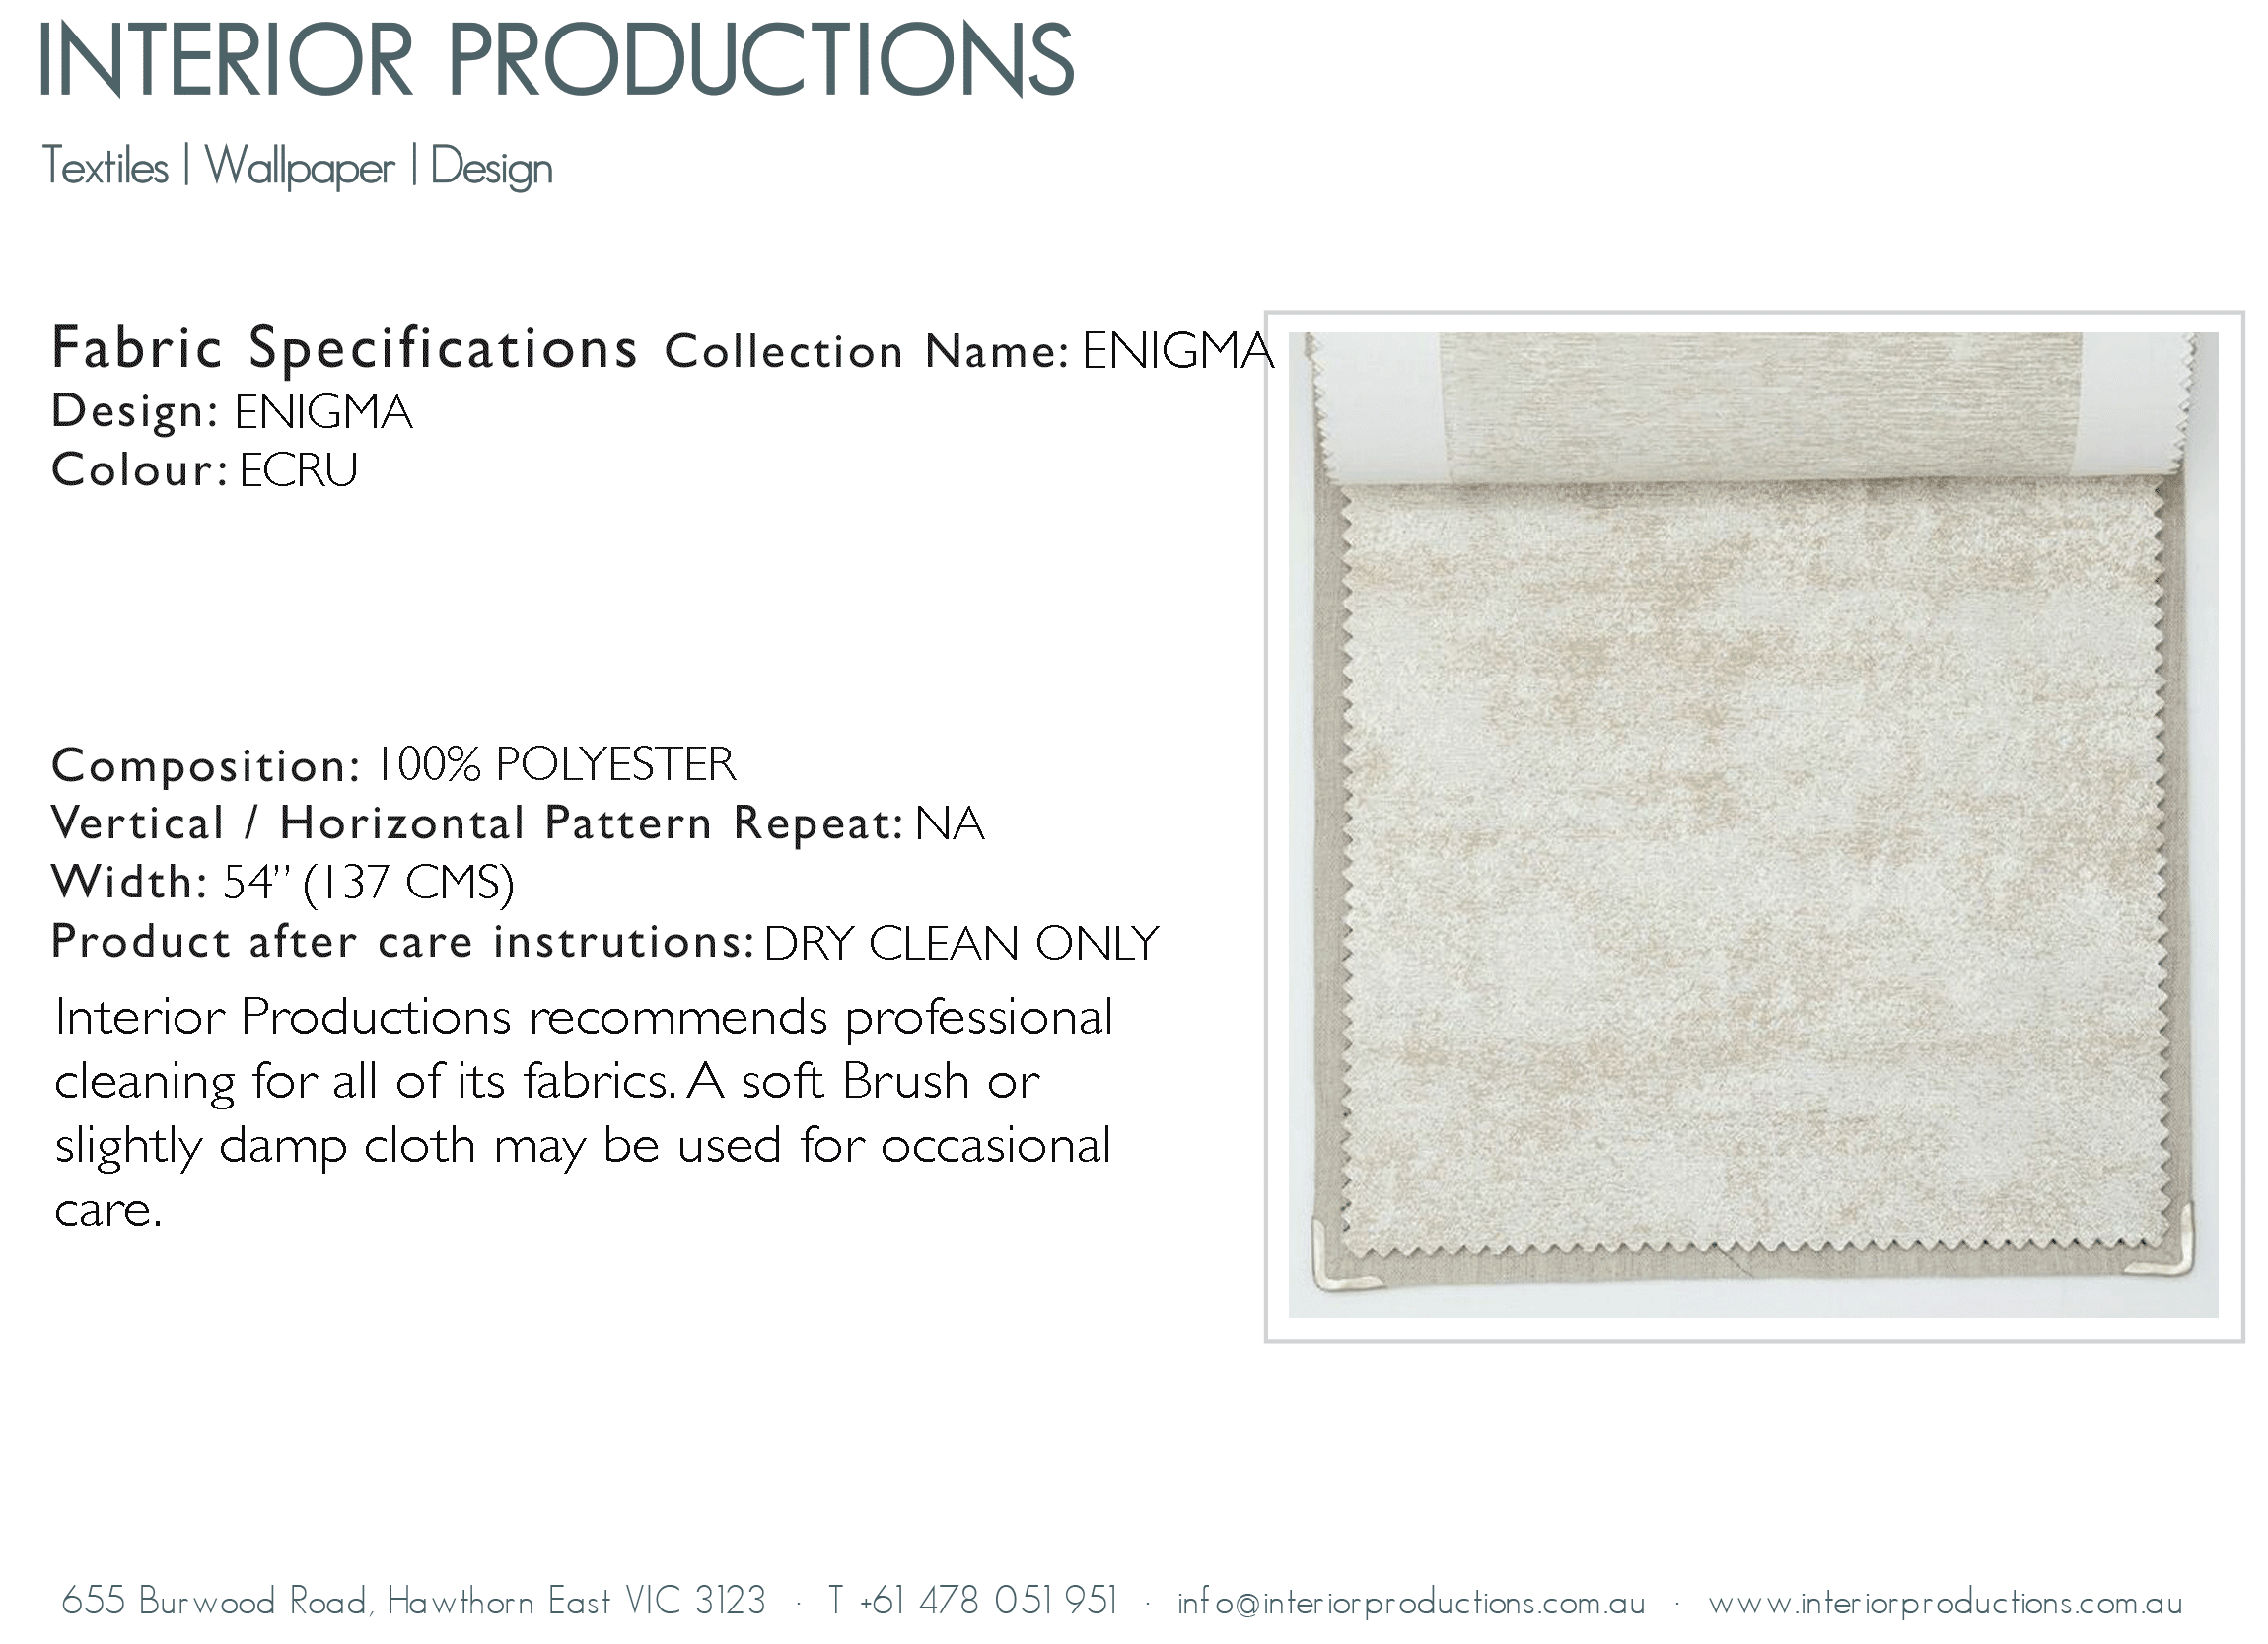 interior_productions_ENIGMA---ECRU